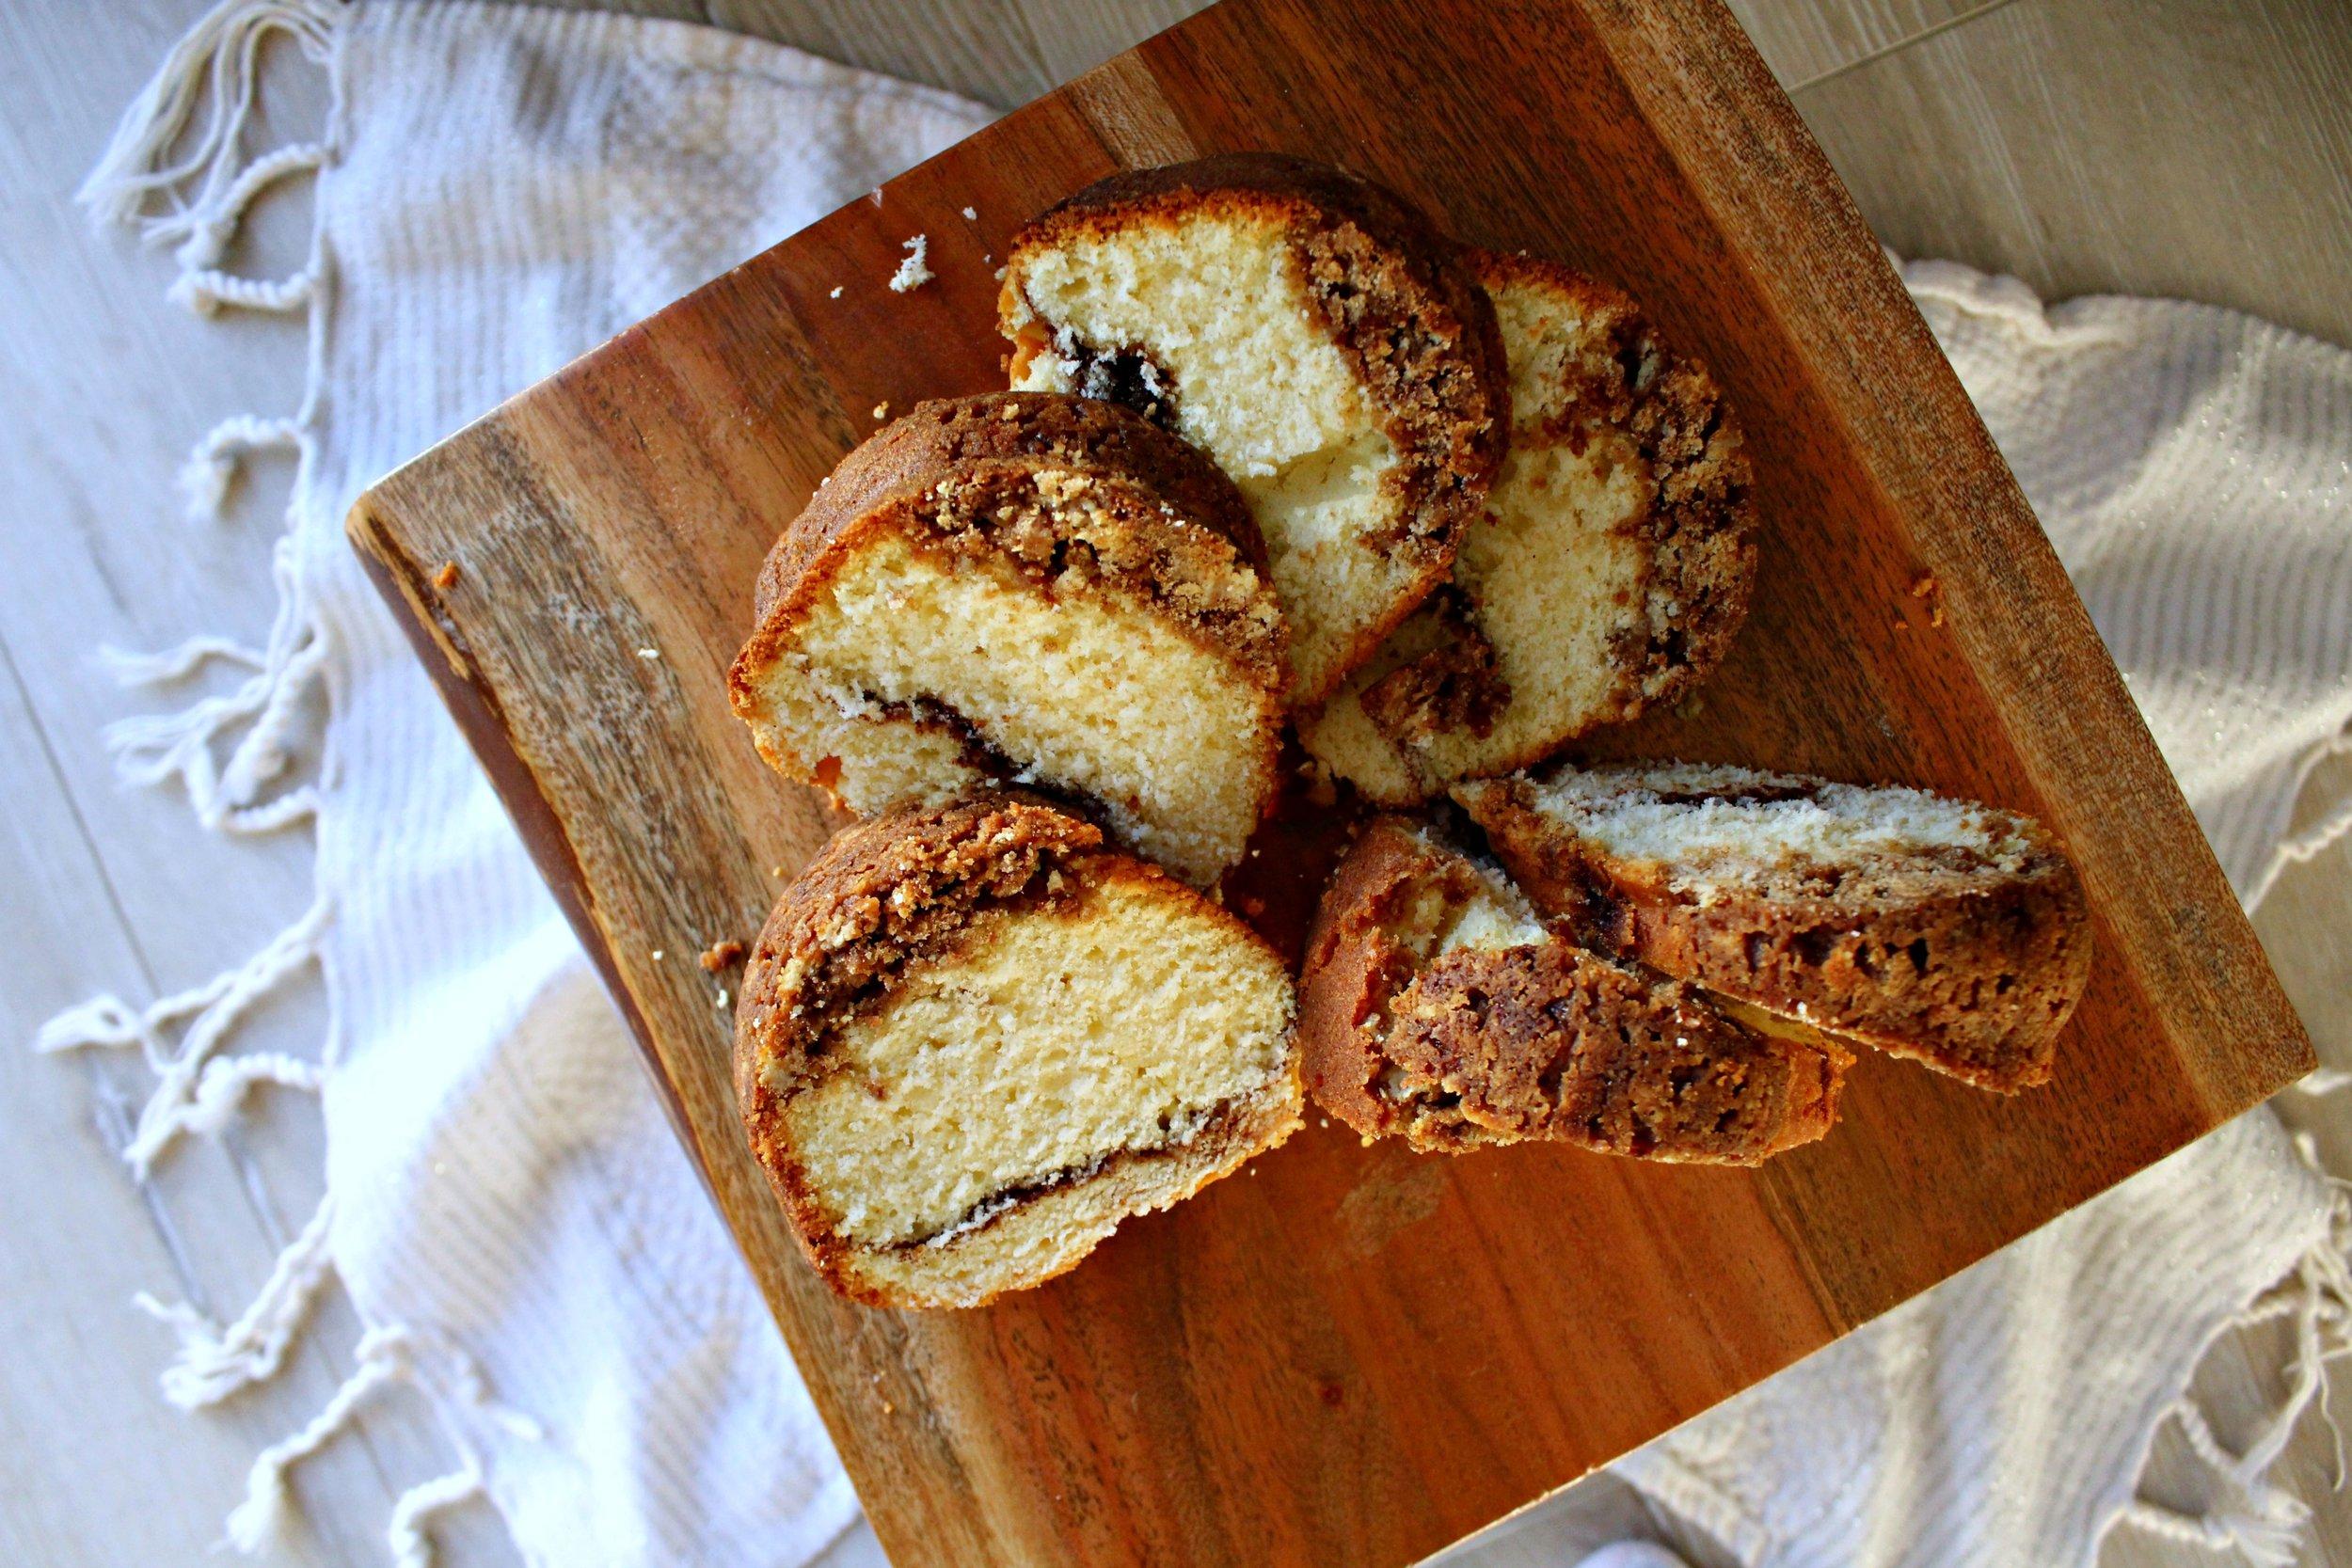 Cinnamon Swirl Bundt Cake with Cinnamon Crumble Topping